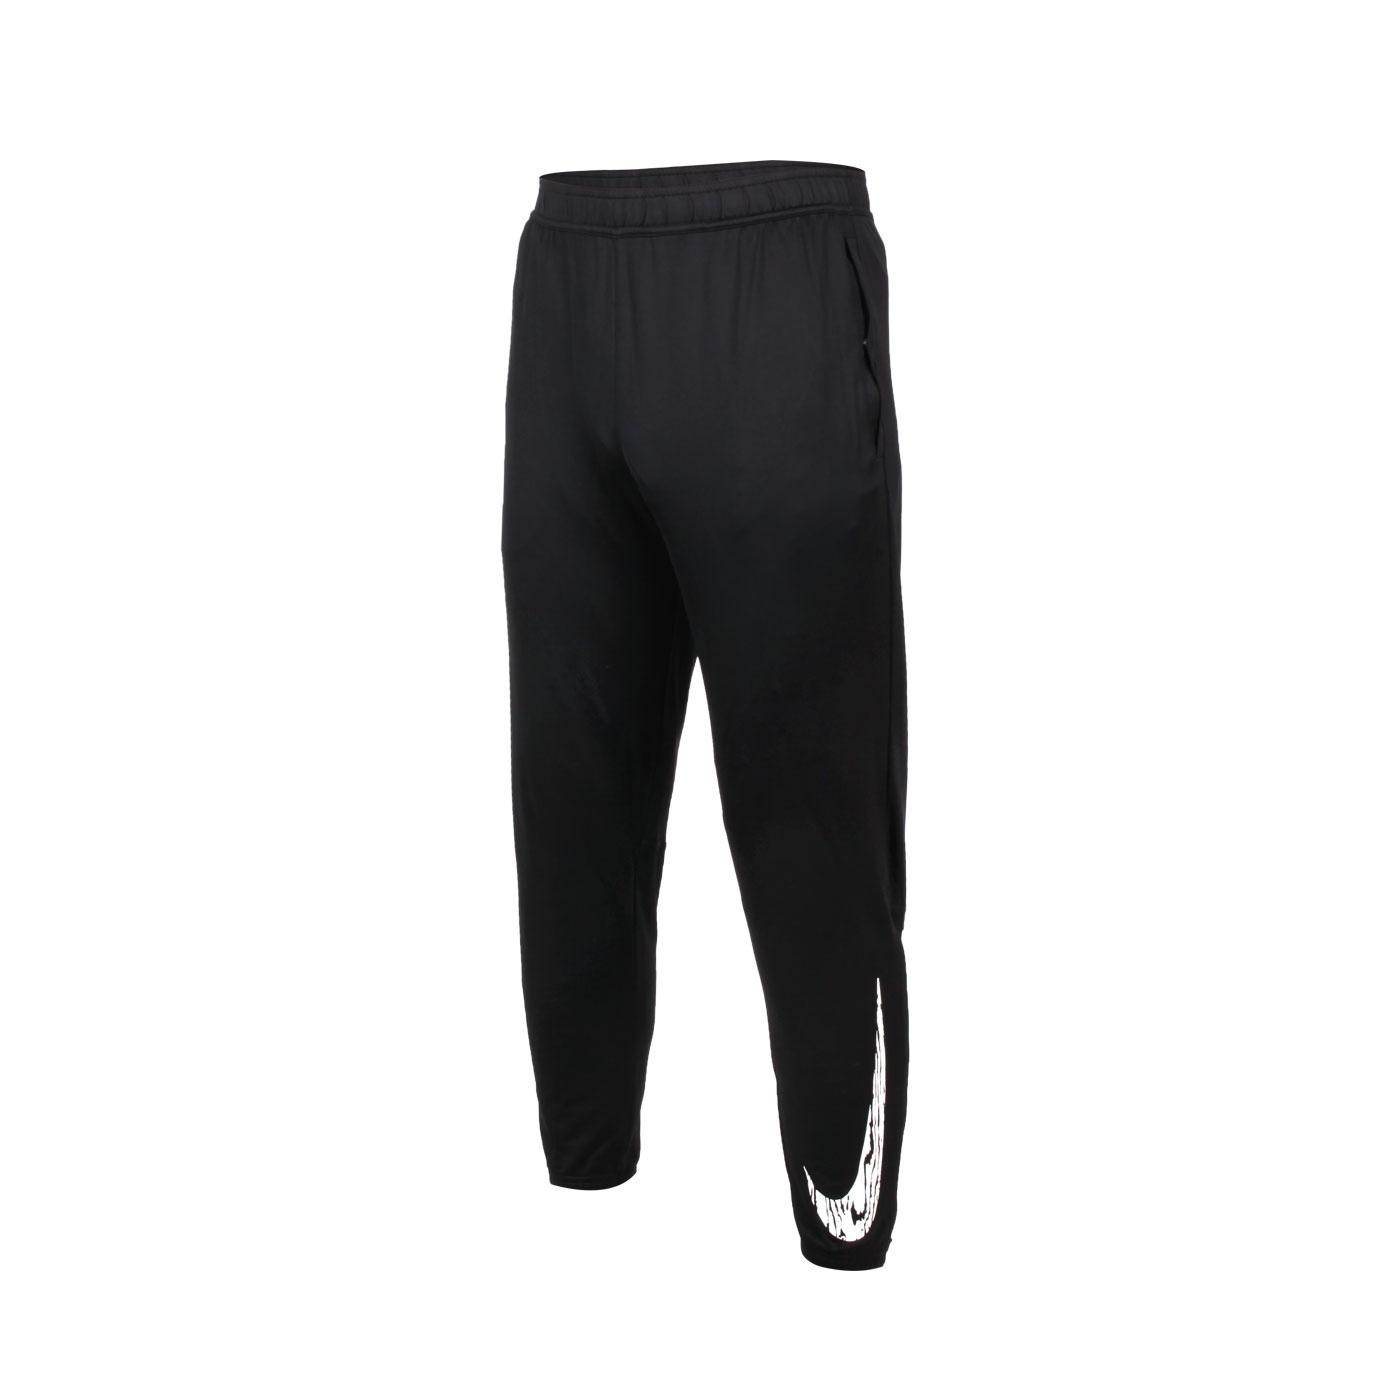 NIKE 男款針織運動長褲 DA0165-010 - 黑白